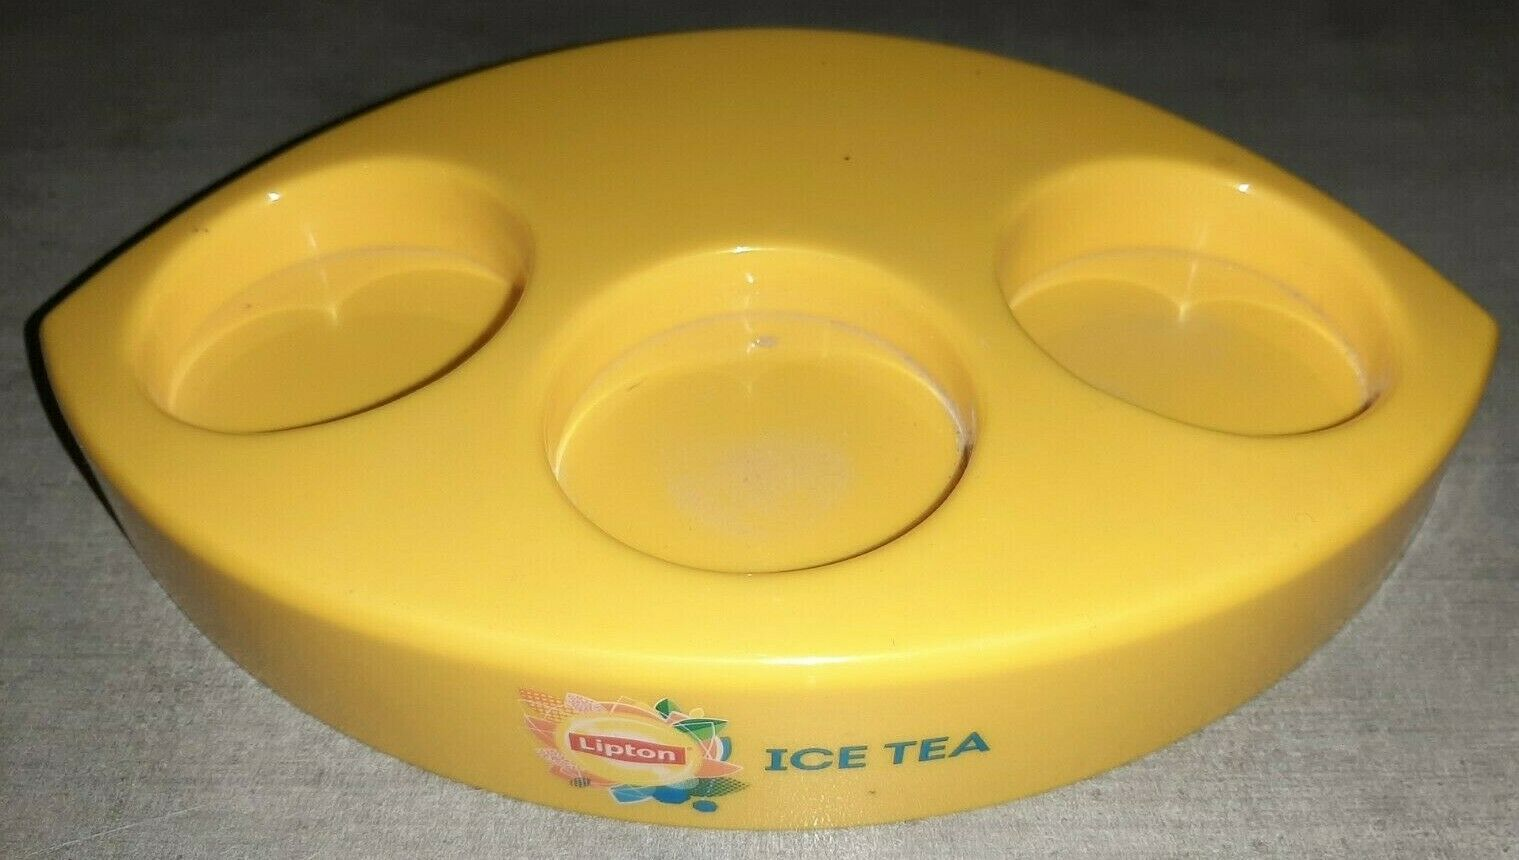 Range gobelet / verre publicitaire marque lipton ice tea 3 verres